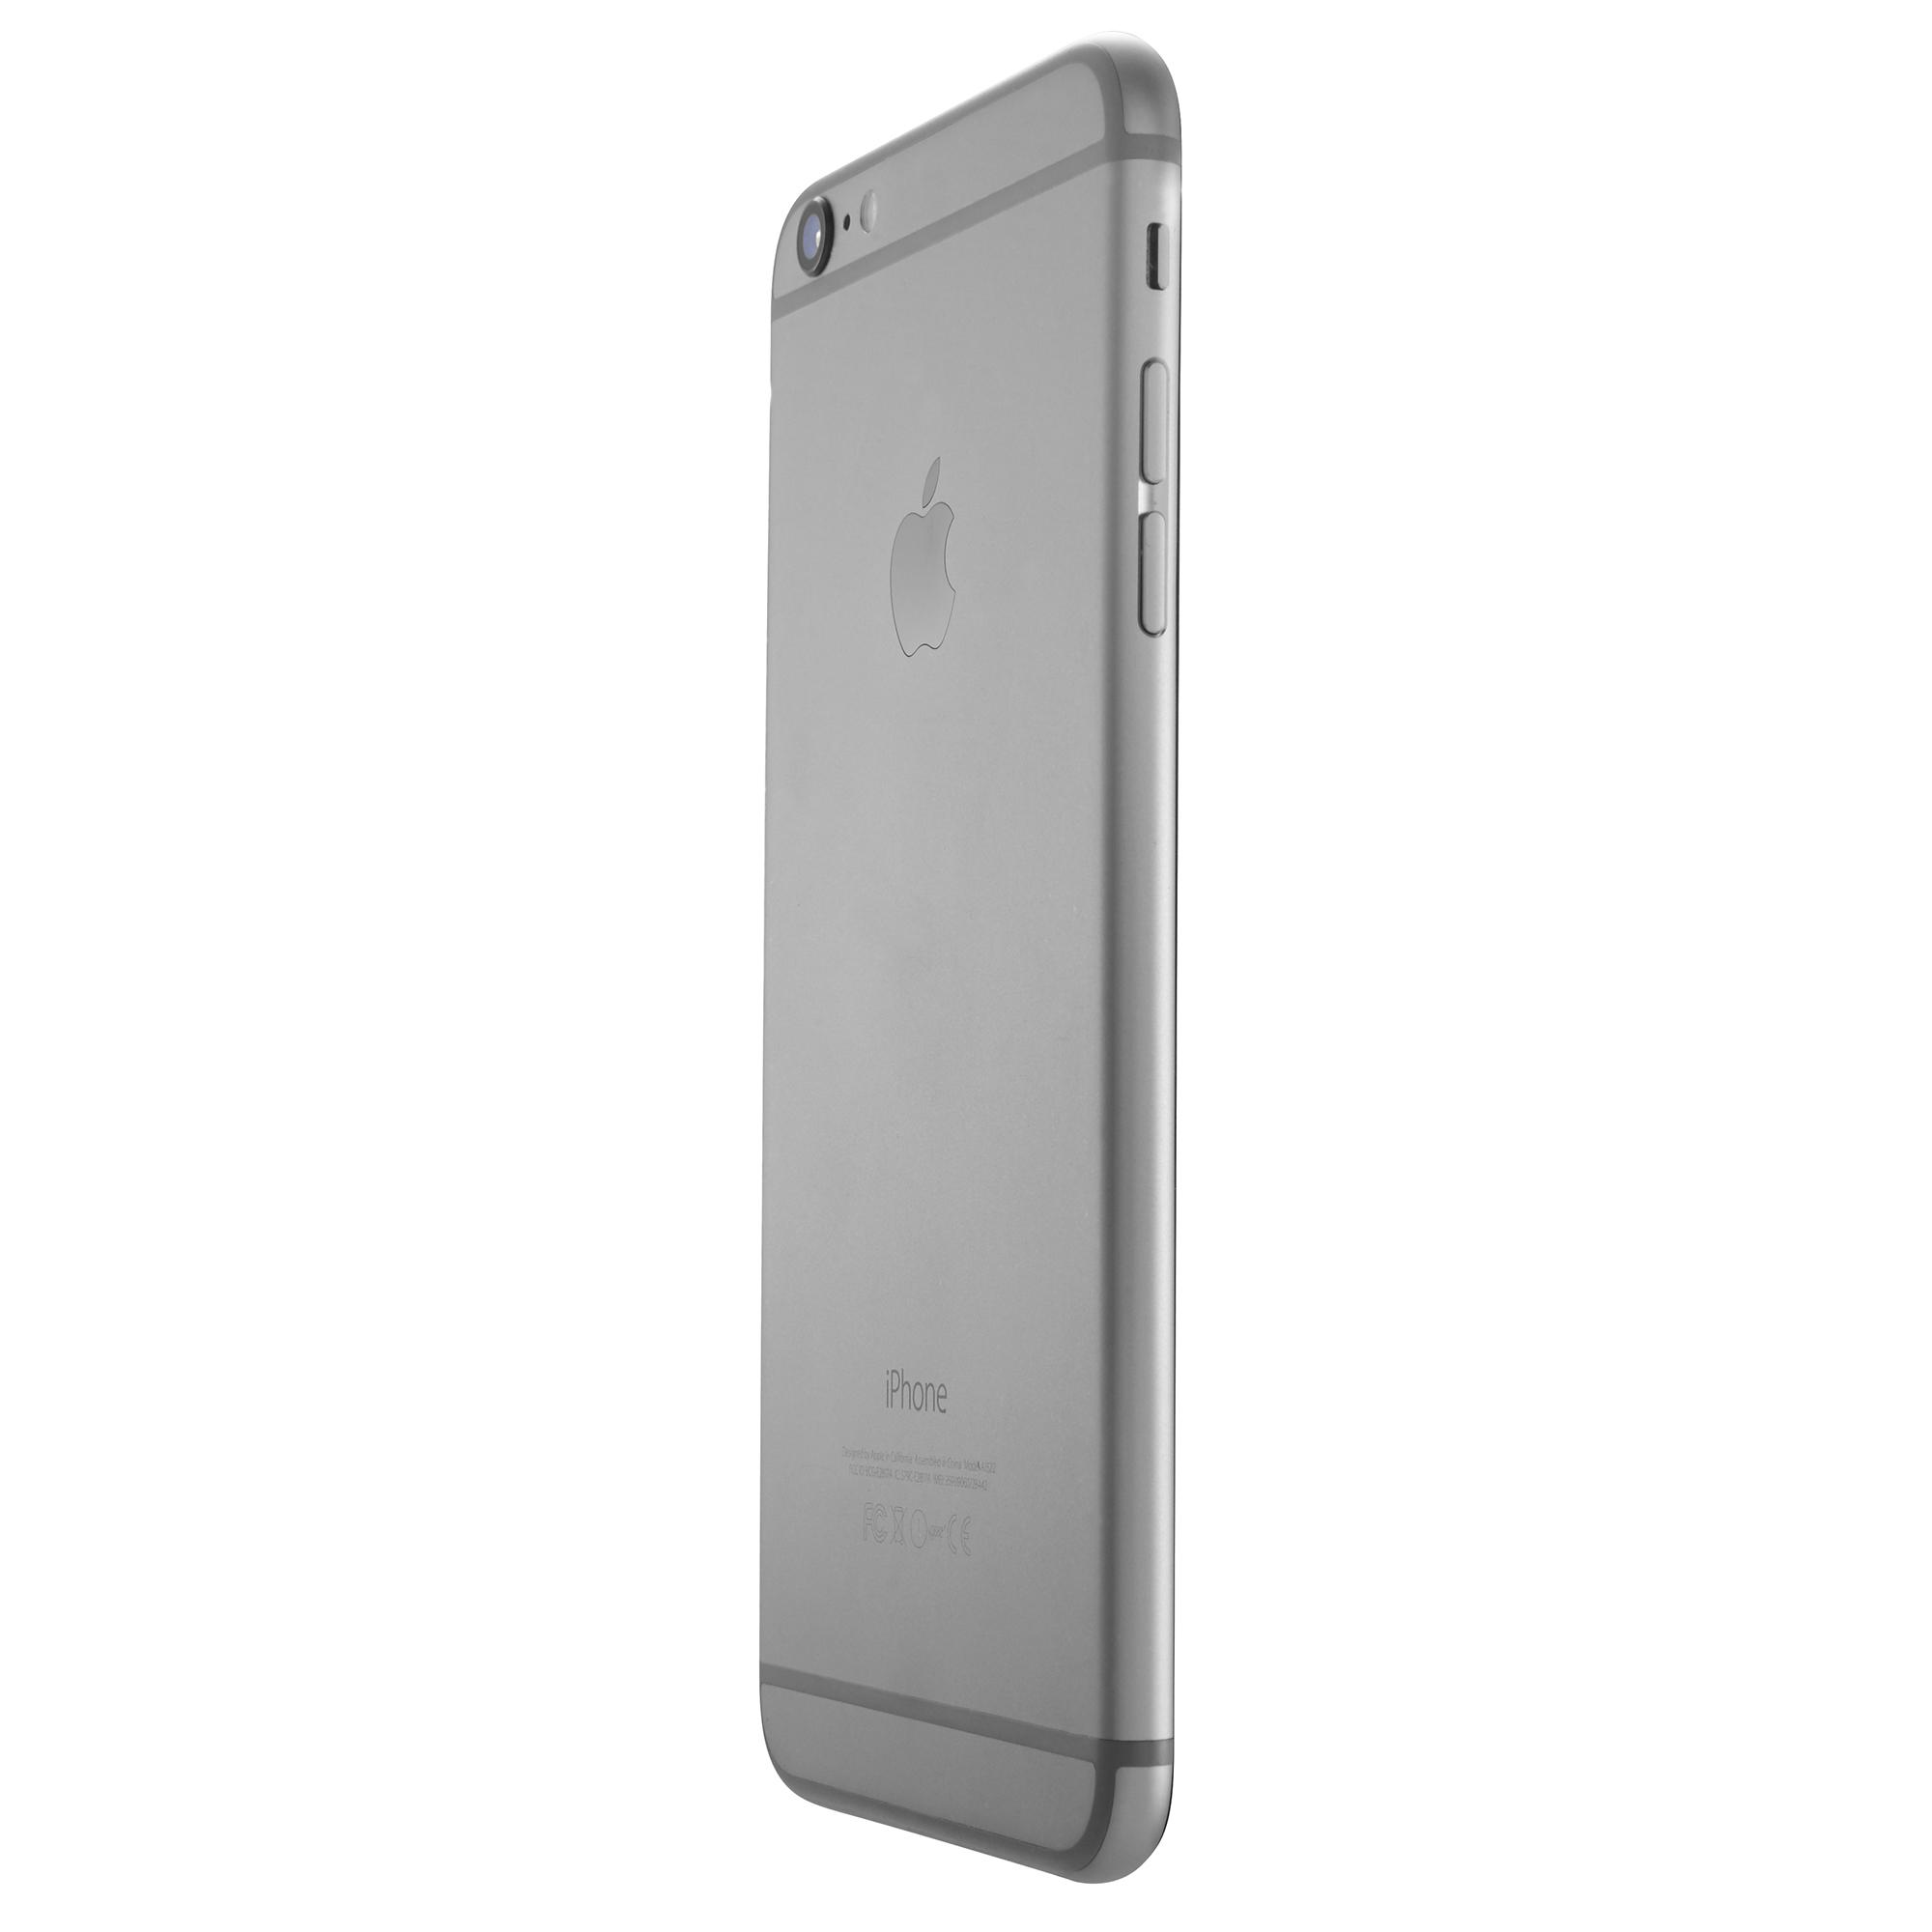 apple iphone 6 plus a1522 16gb verizon unlocked very good. Black Bedroom Furniture Sets. Home Design Ideas